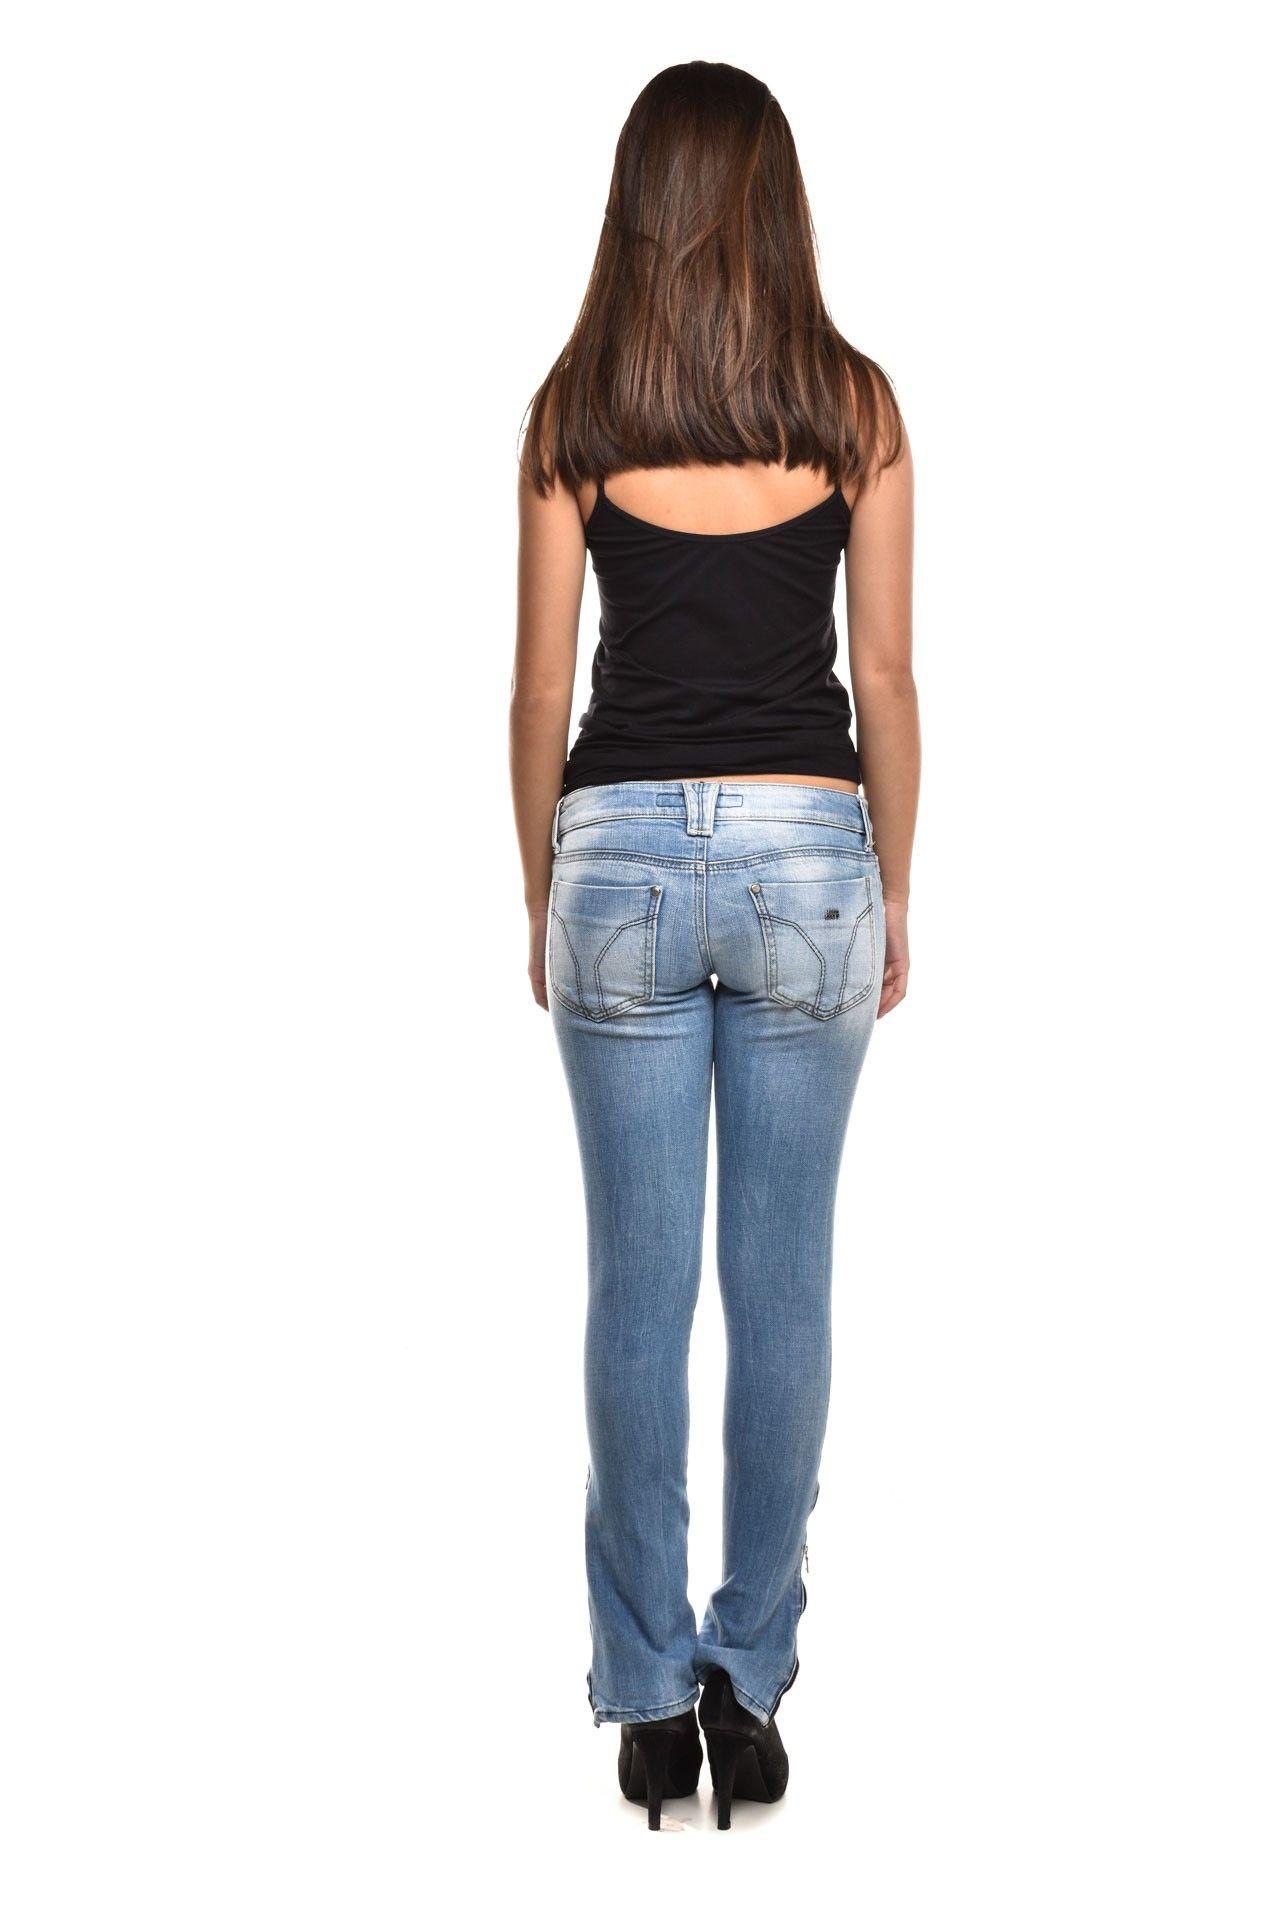 Miss Sixty - Calça Jeans Clara - Foto 4